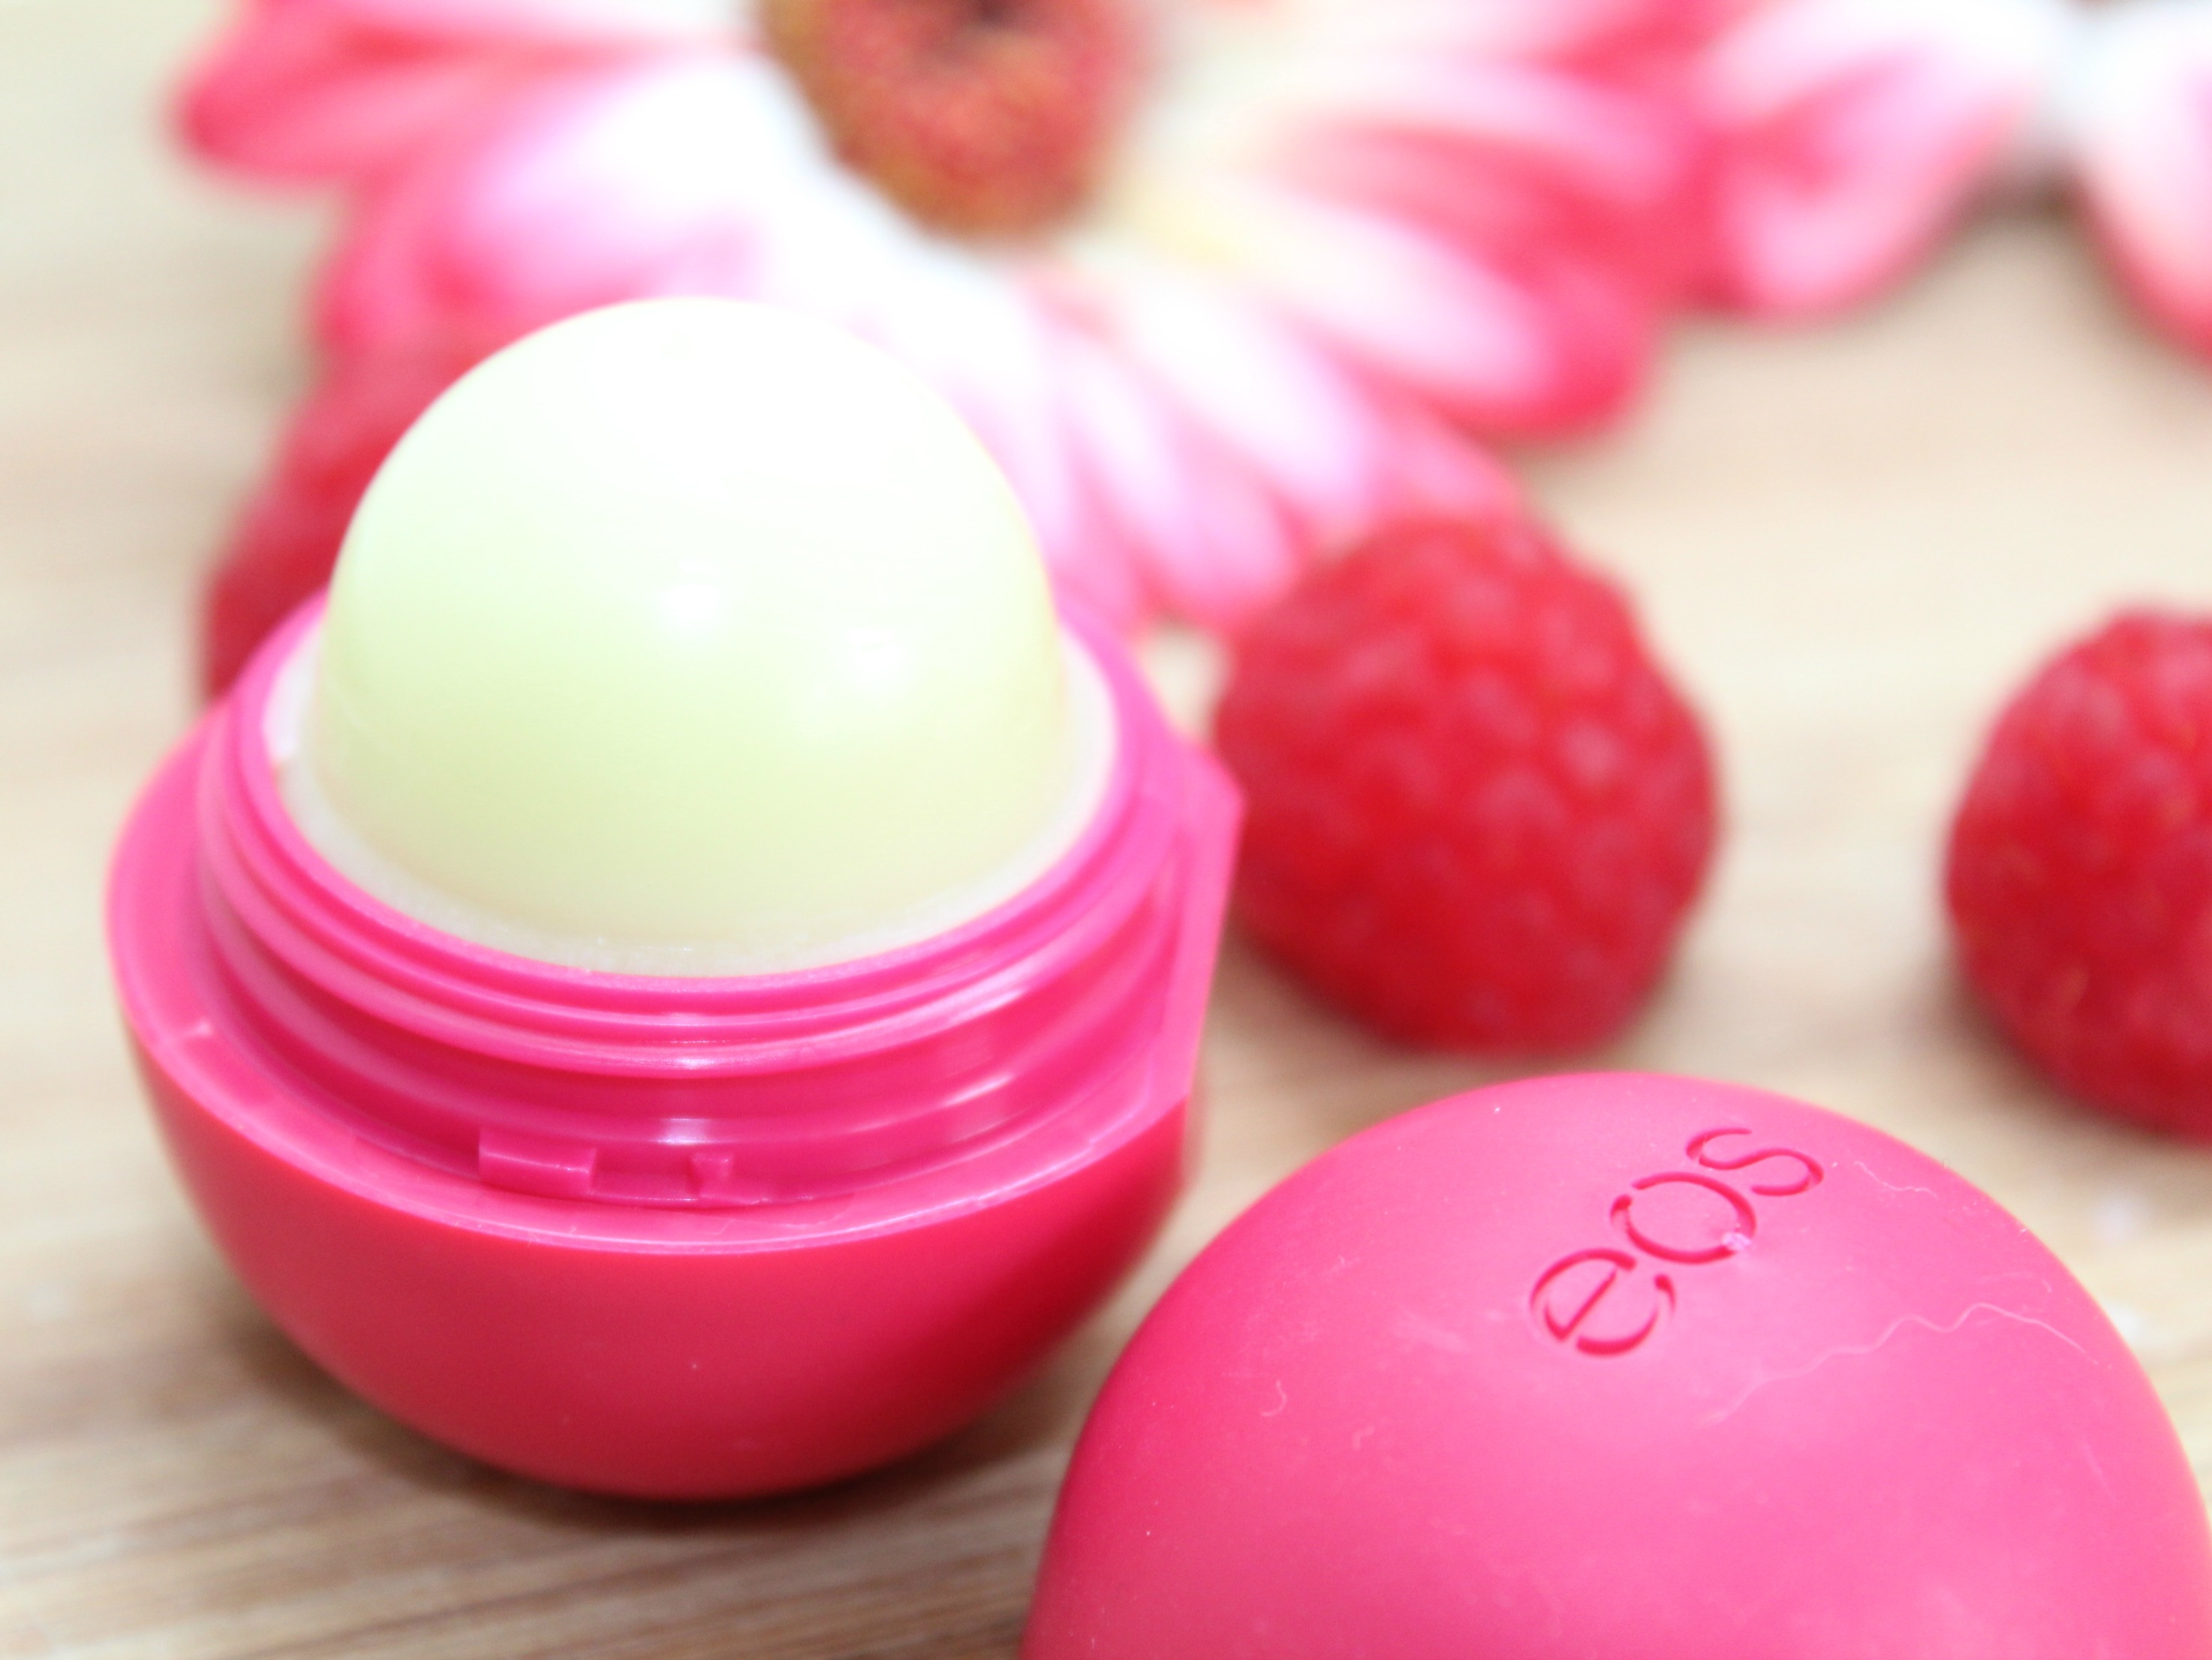 EOS Pomegranate Rasberry lipbalm-GoodGirlsCompany-review